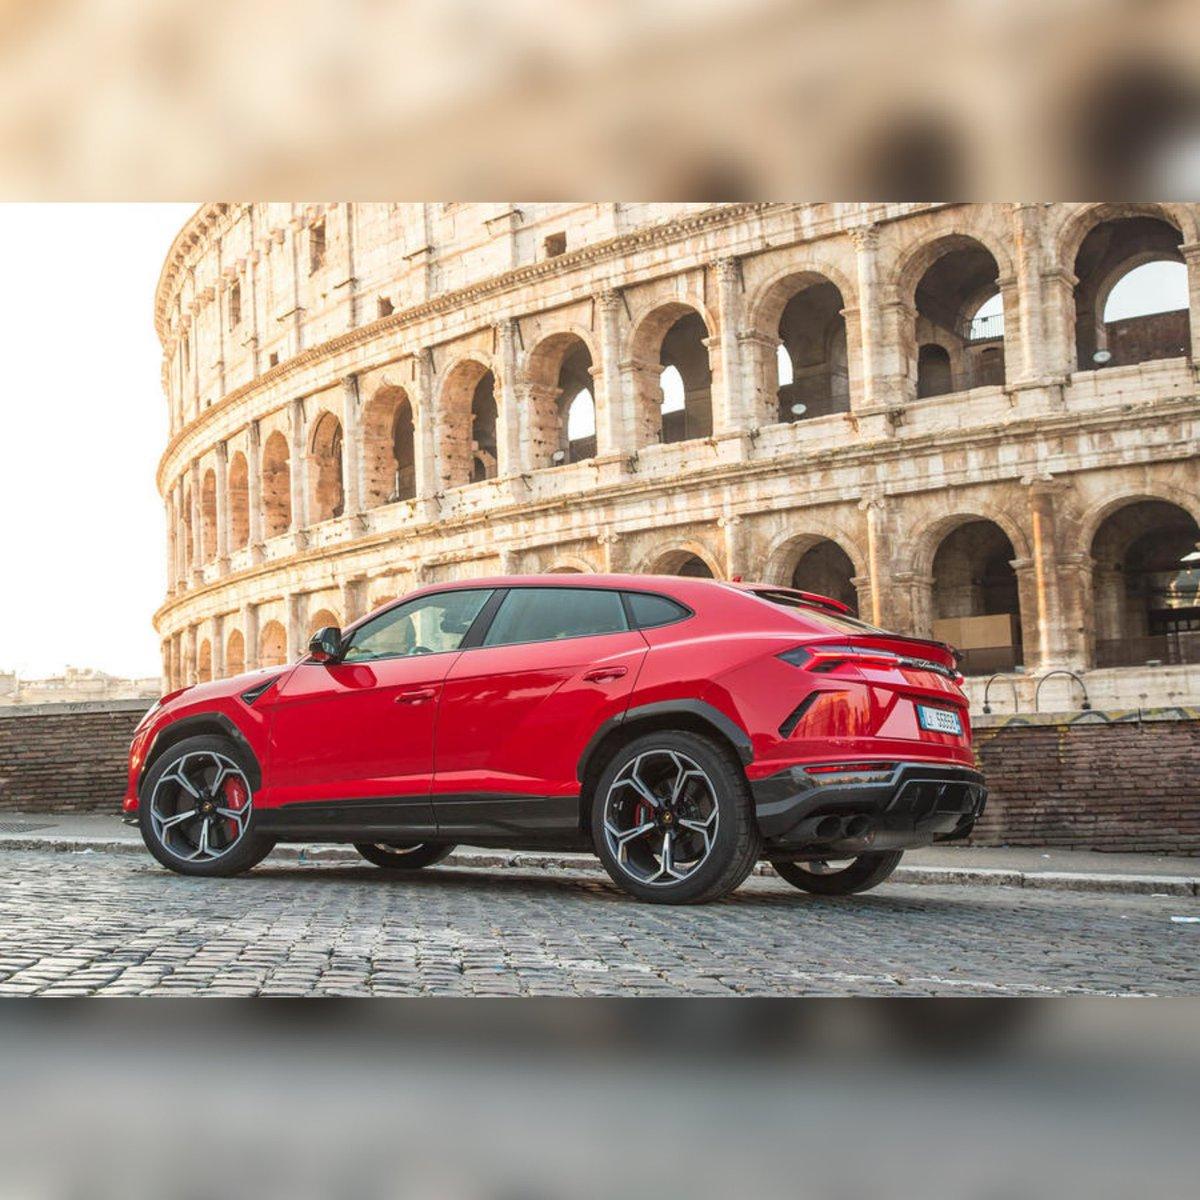 The Phone Talks On Twitter First Lamborghini Urus Suv Arrives In